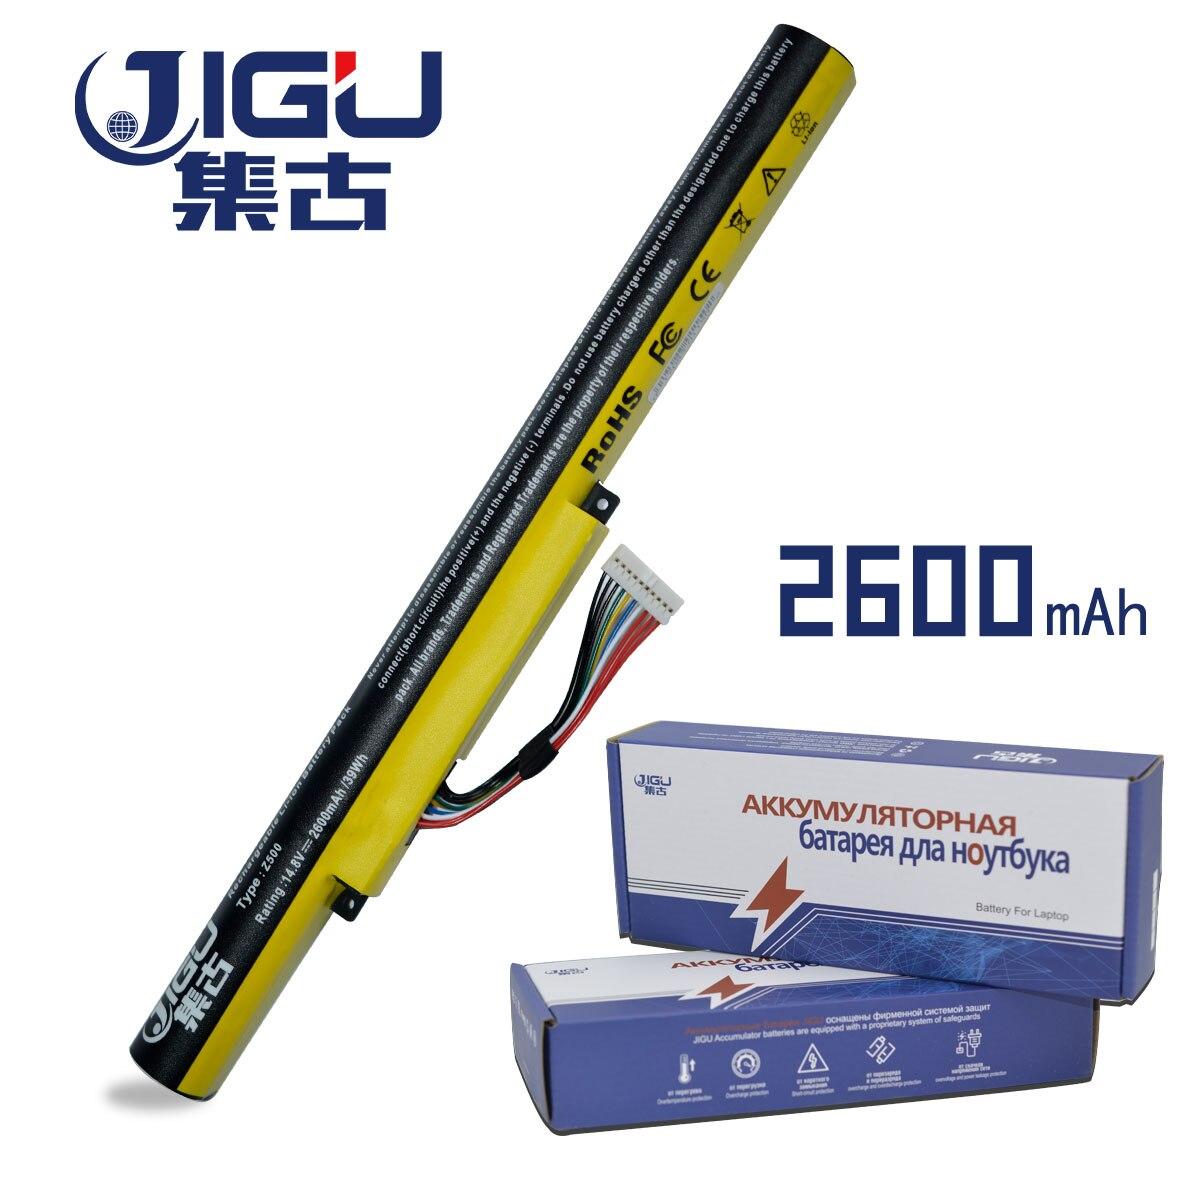 Jigu 2600 мАч ноутбука Батарея L12S4E21 L12M4E21 L12M4K01 L12S4K01 для <font><b>Lenovo</b></font> IdeaPad Z400 Z400S Z400A Z400T <font><b>Z510</b></font> Z510A Z500 Z500A